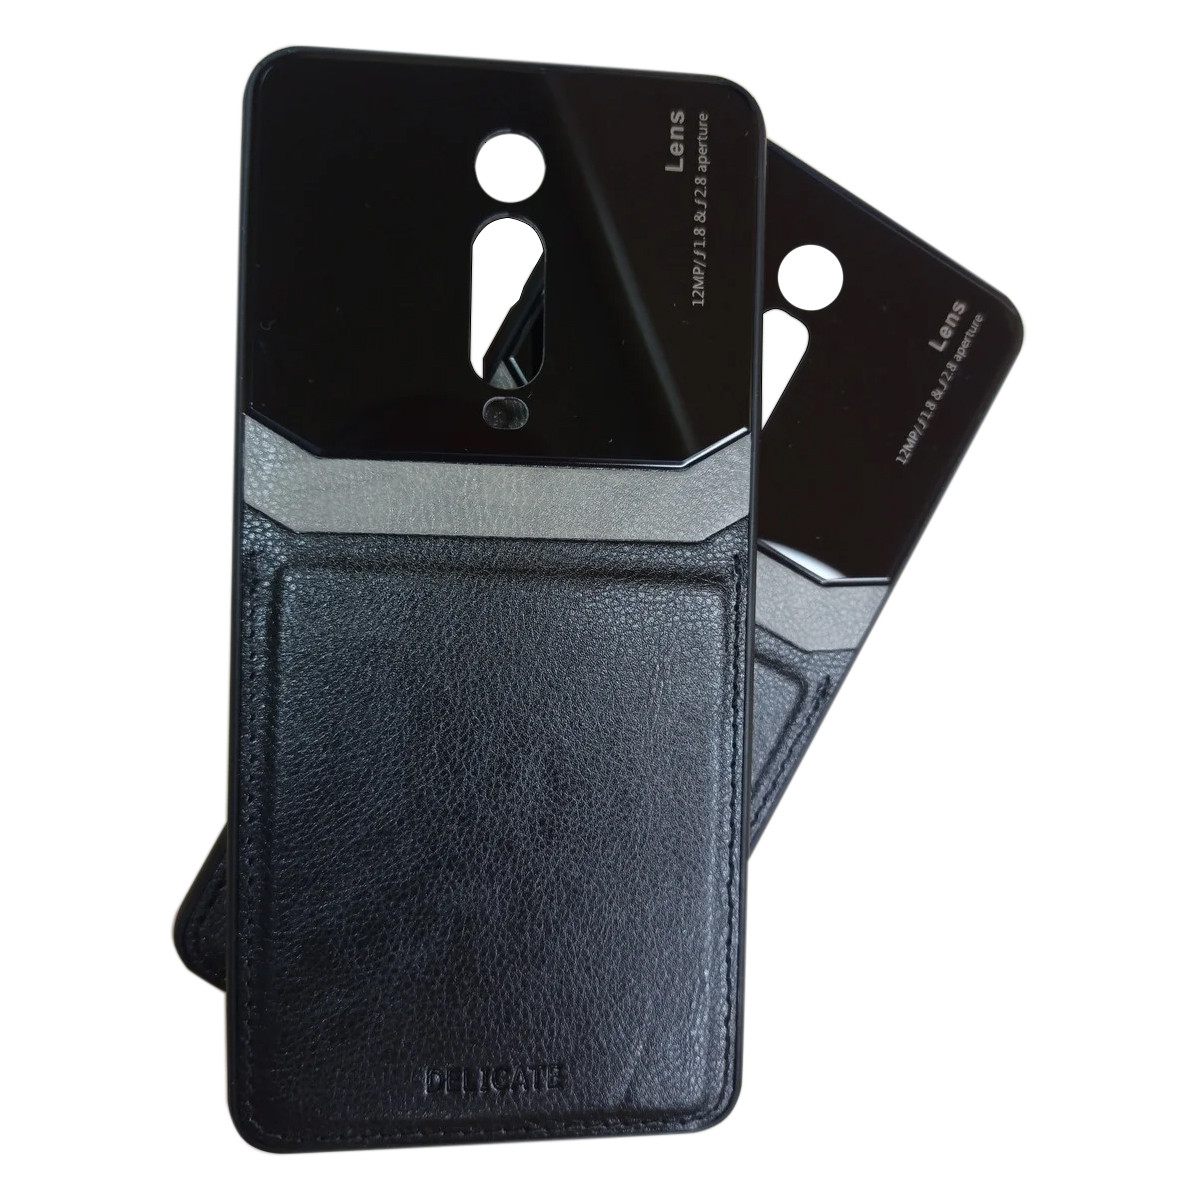 Чехол бампер Primolux Delicate для смартфона Xiaomi Mi 9T / Mi 9T Pro / Redmi K20 / K20 Pro - Black